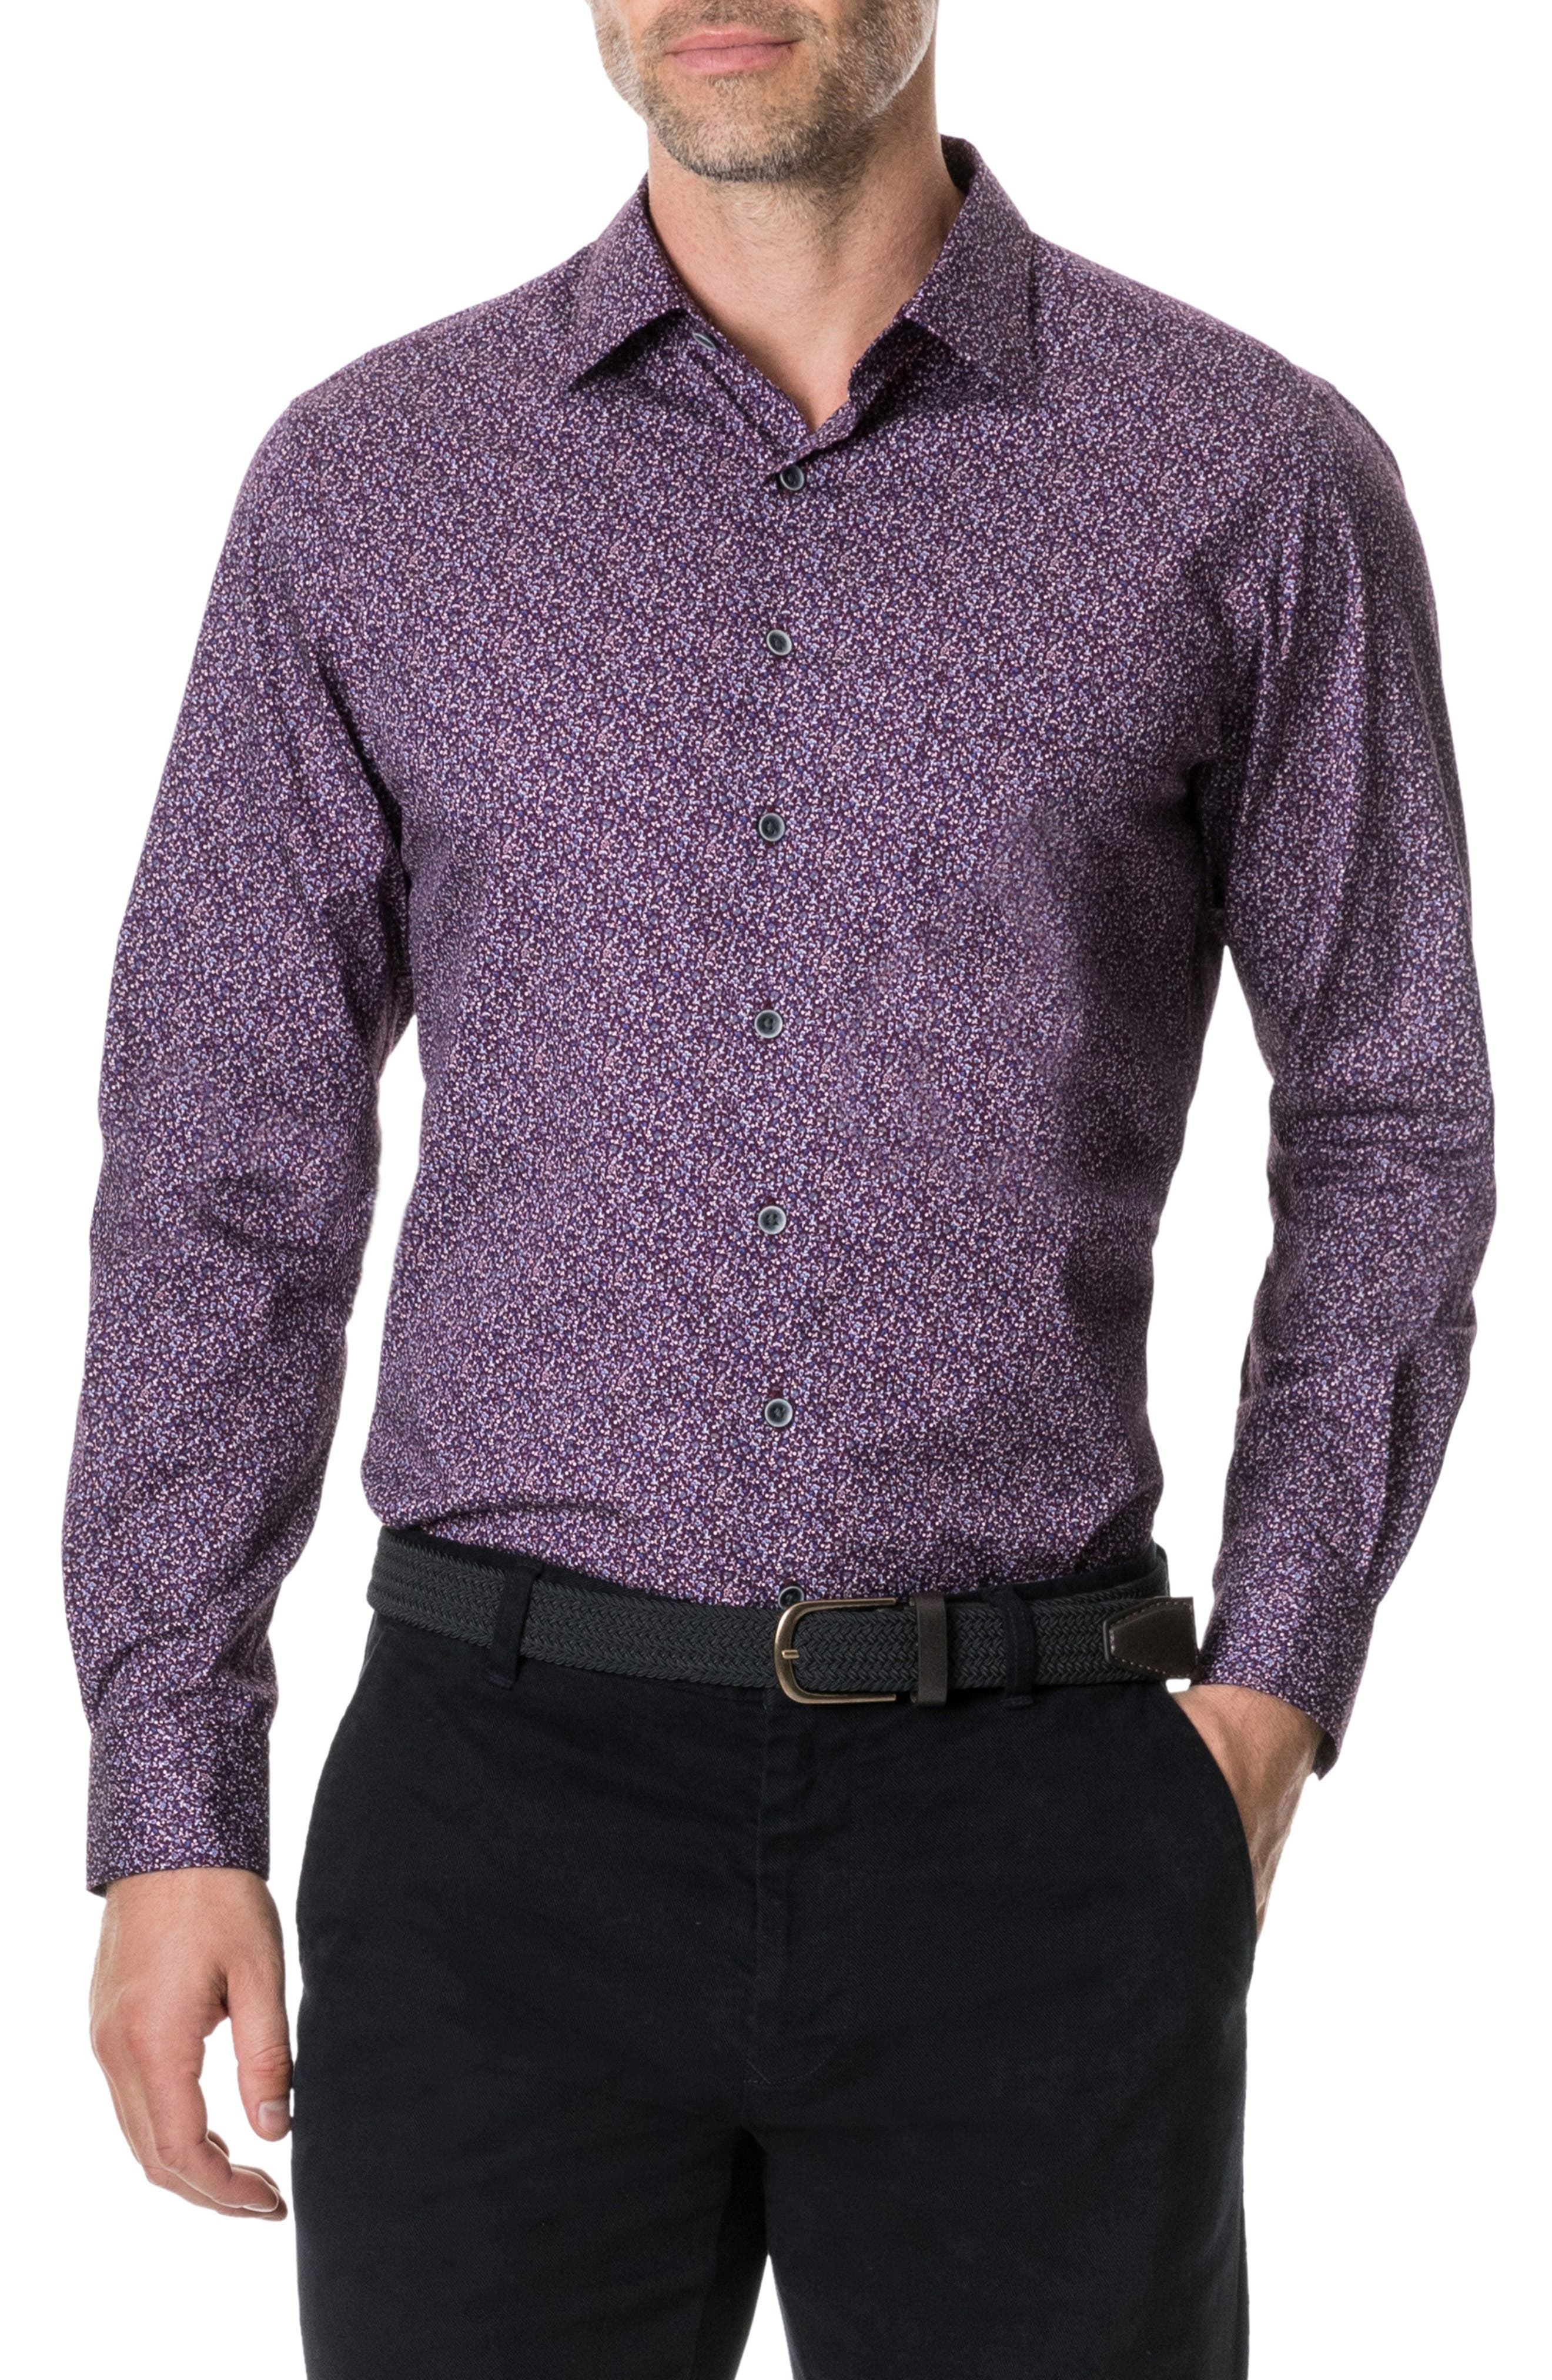 Scotland Street Regular Fit Floral Sport Shirt,                             Main thumbnail 1, color,                             PLUM PURPLE